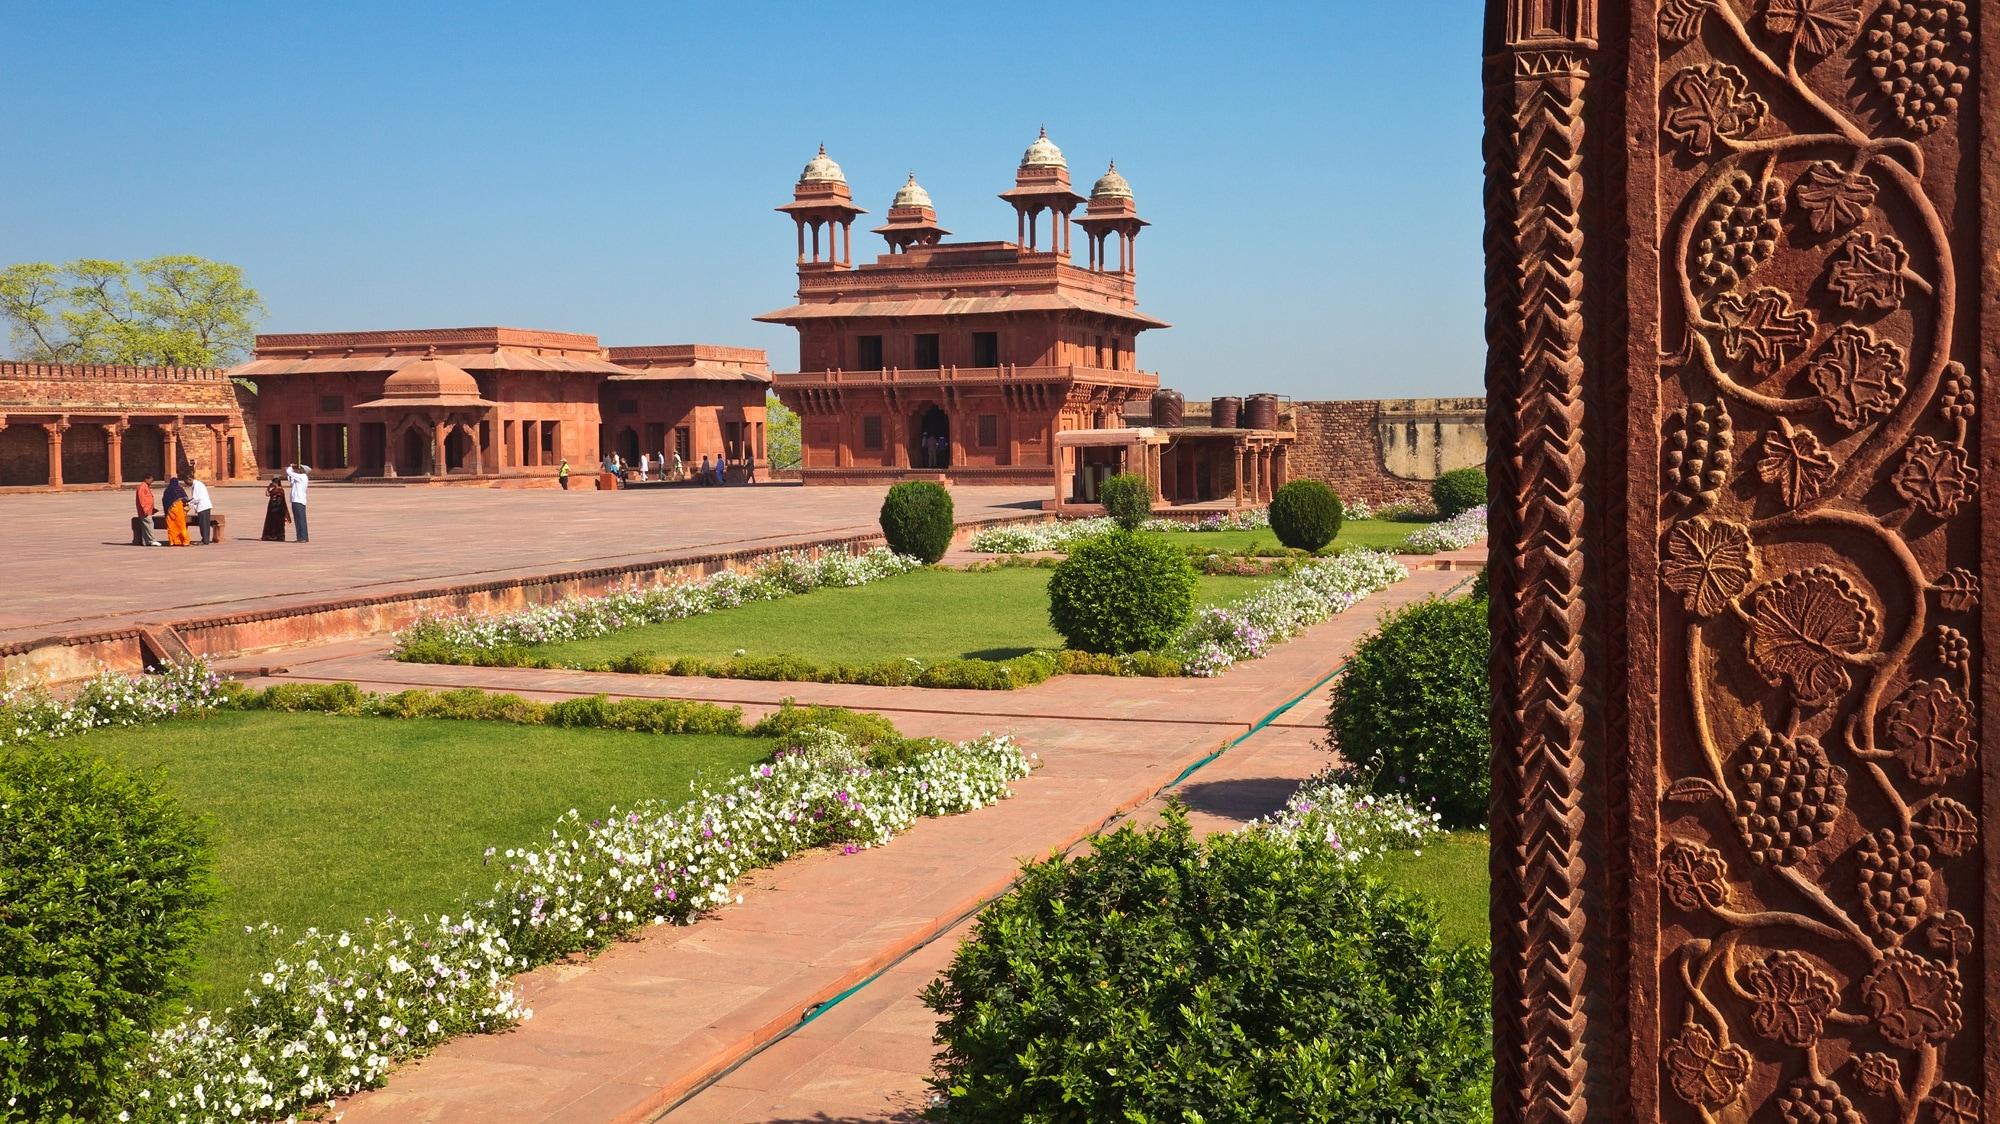 Diwan-i-Khas Hall in Fatehpur Sikri